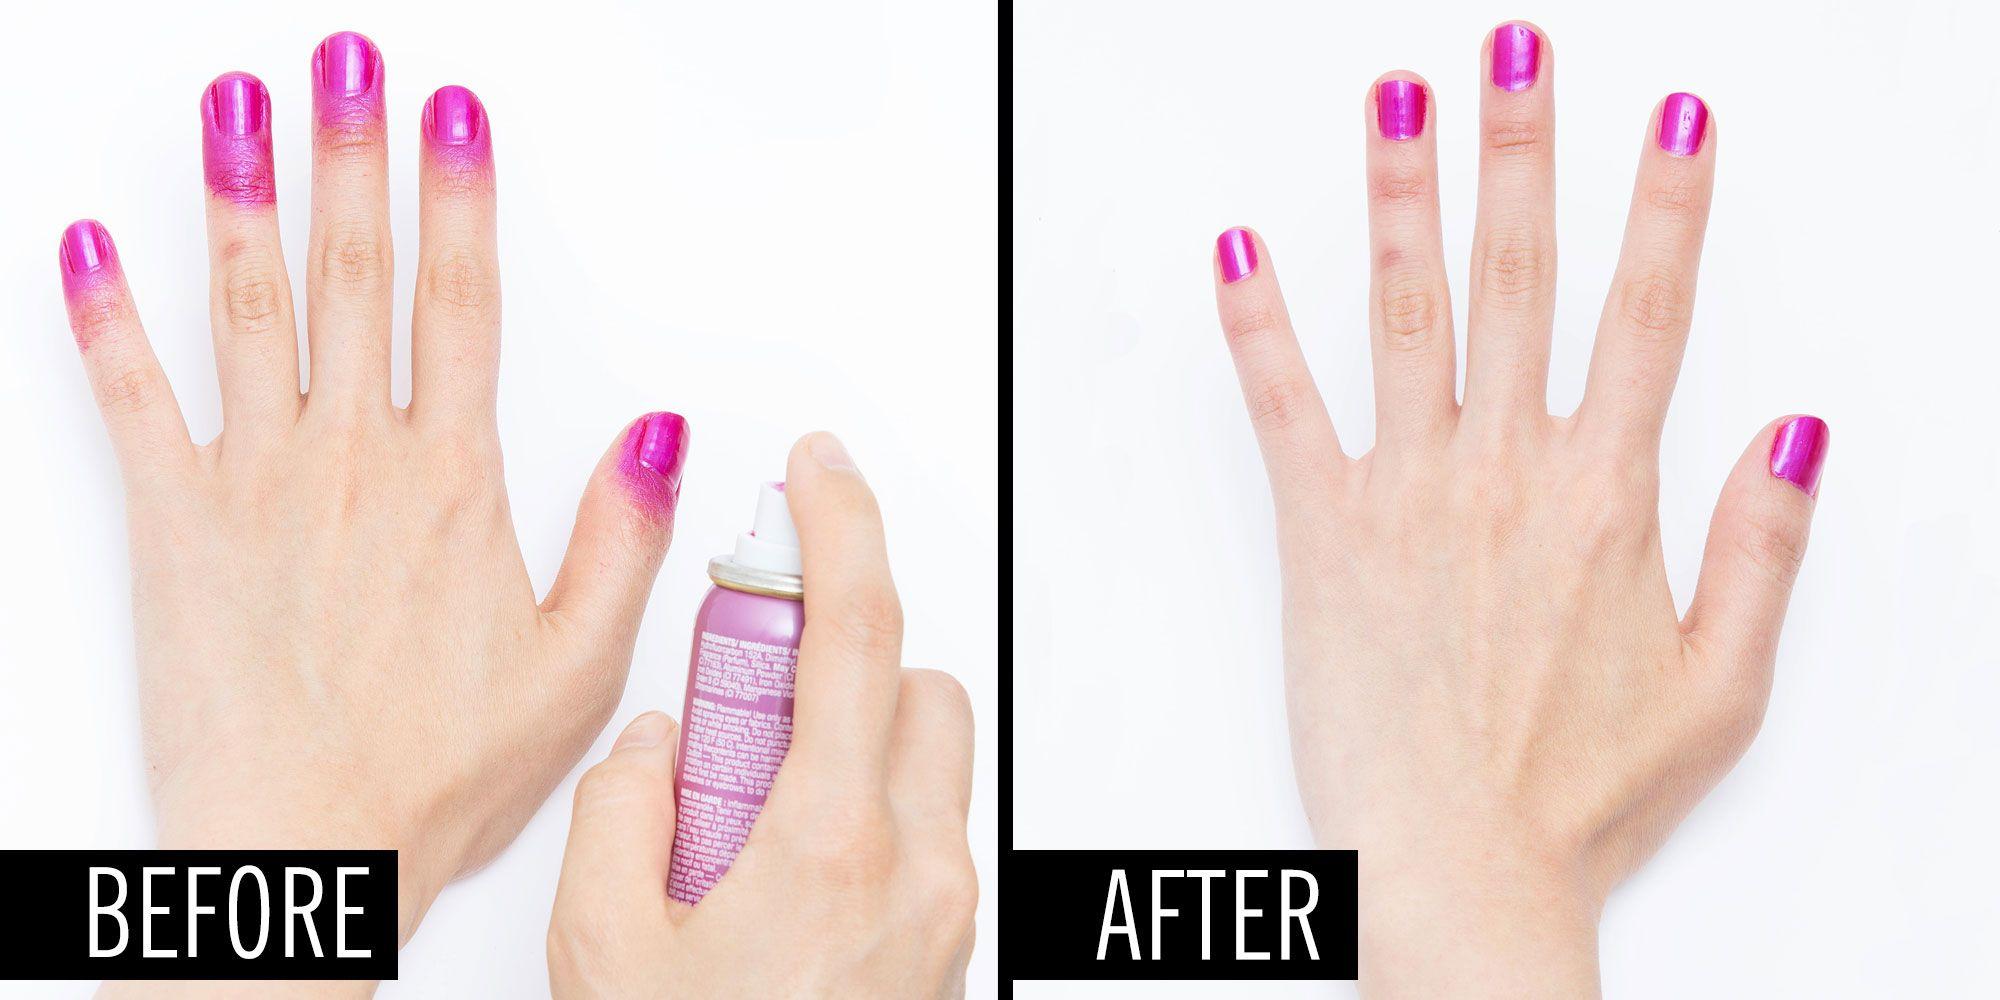 Spray-On Nail Polish - China Glaze Spray Nail Polish Reviews